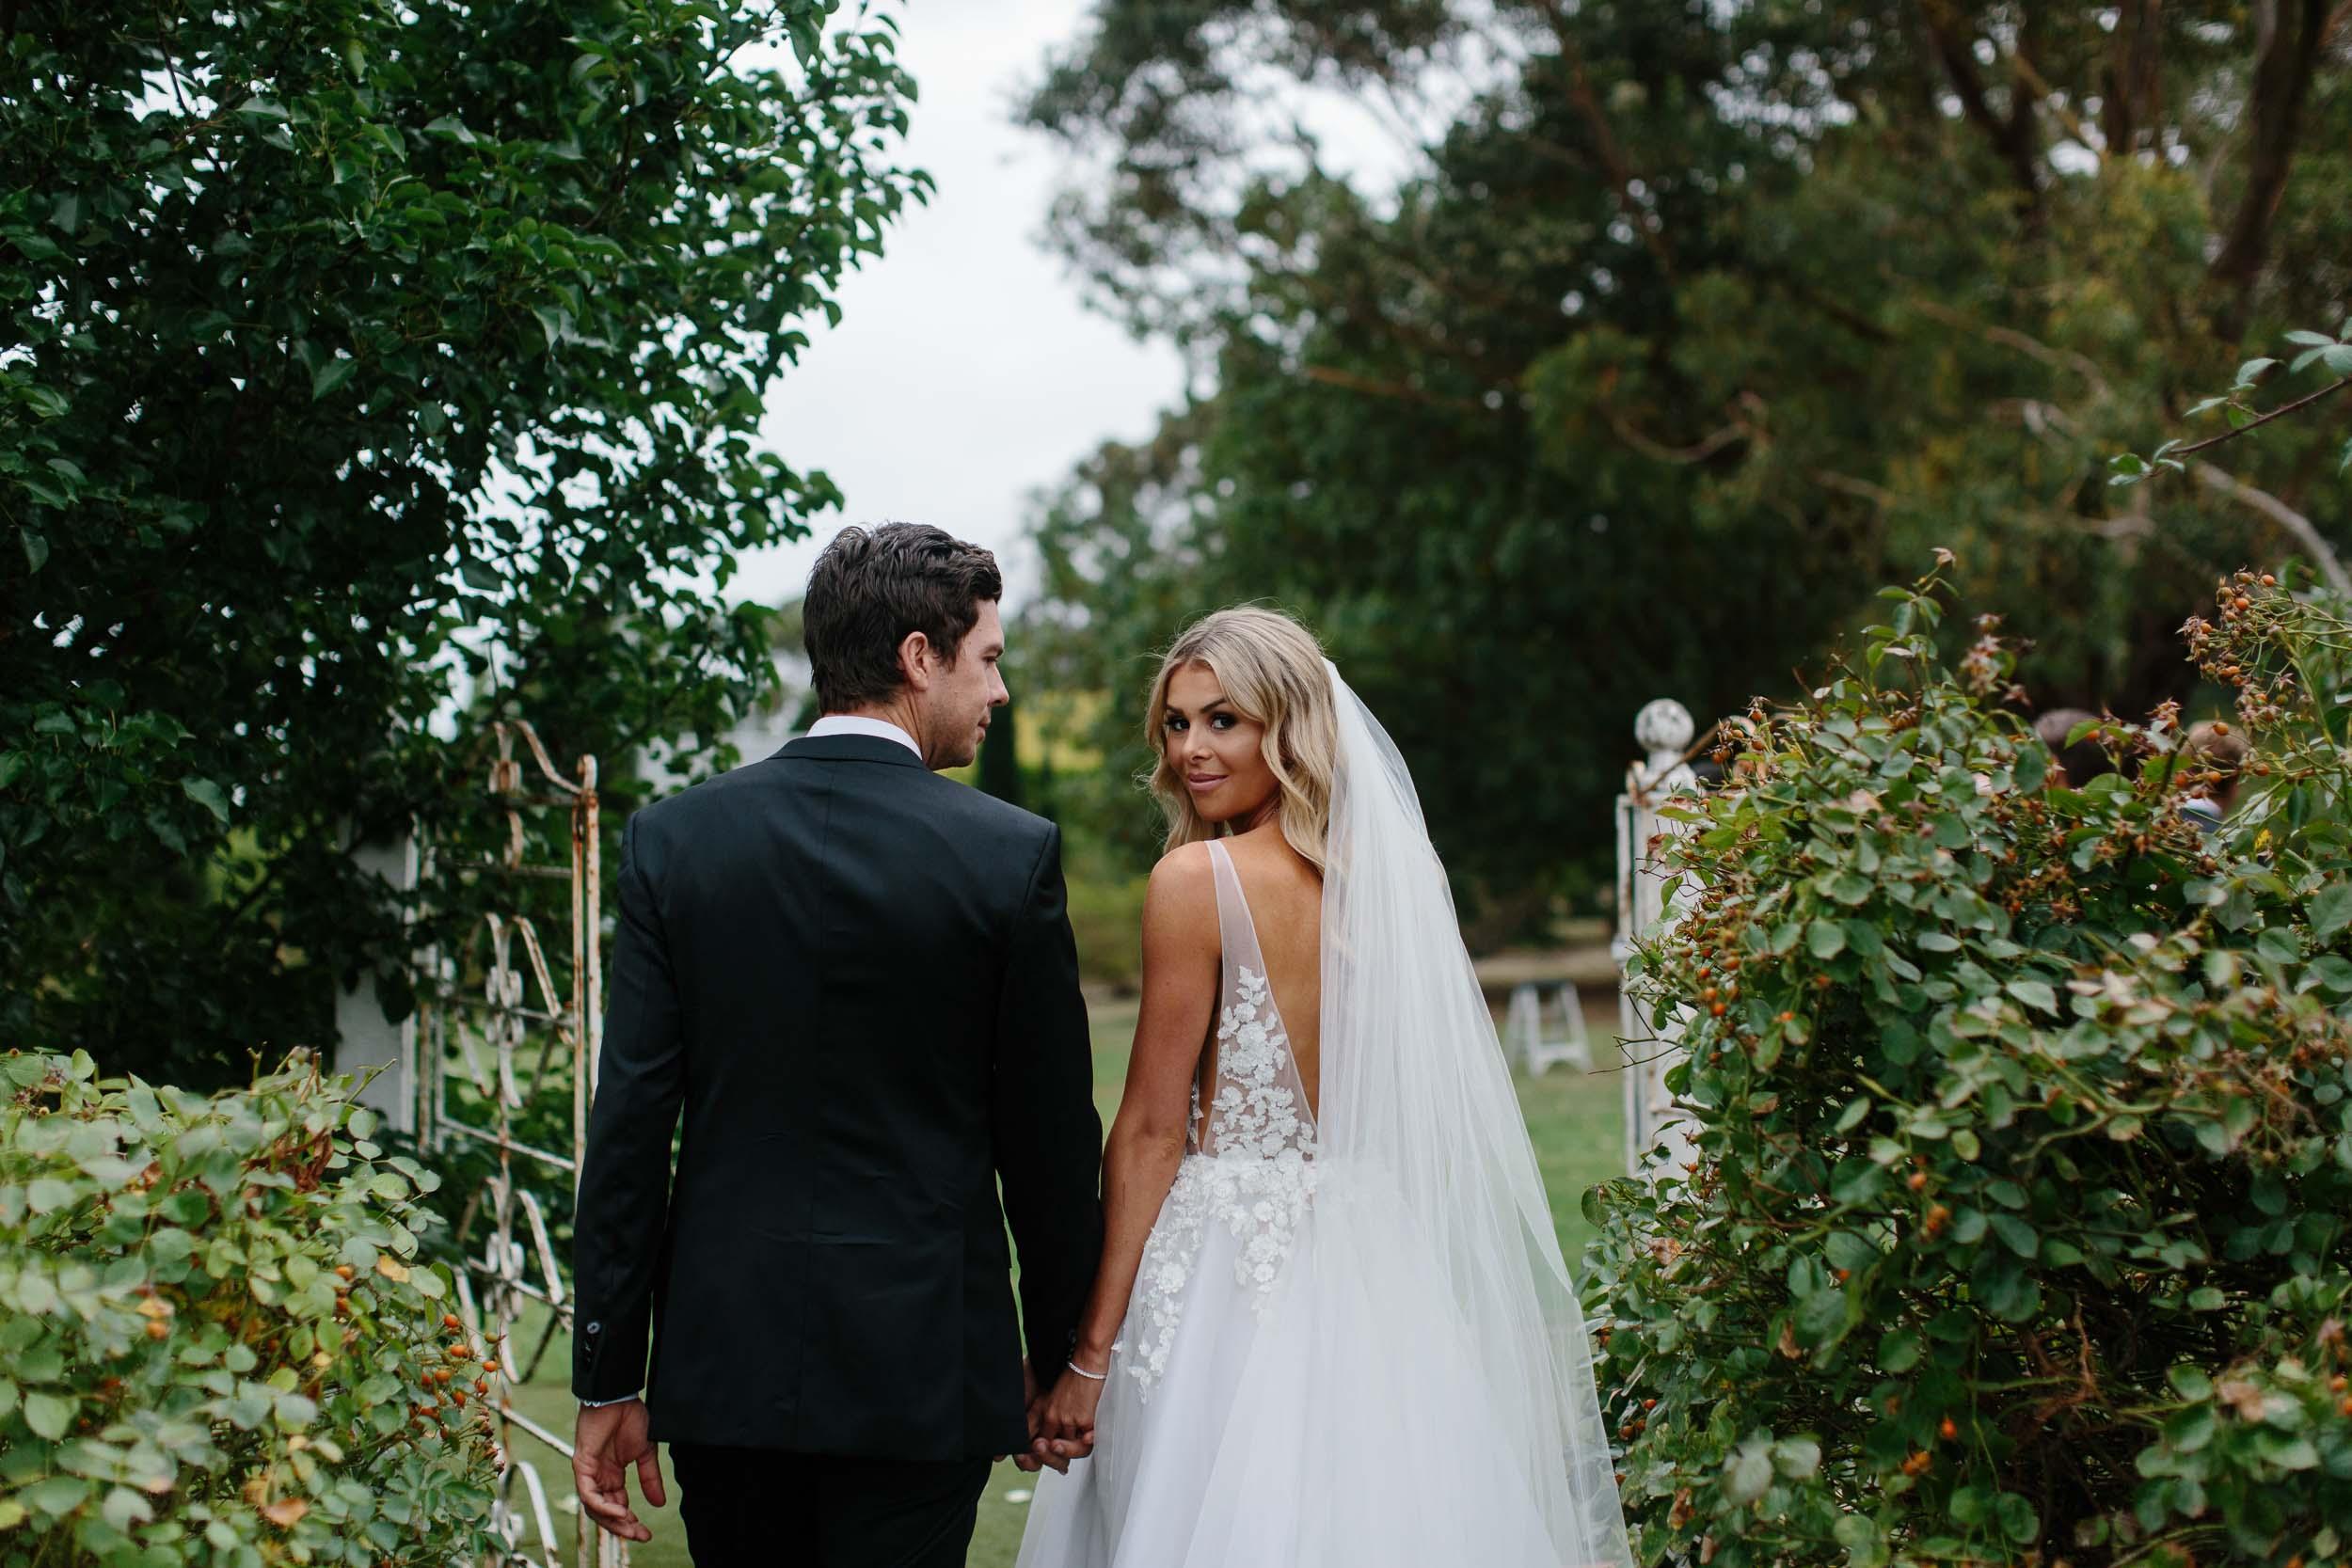 Kas-Richards-Mornington-Peninsula-Private-Property-Wedding-Marianna-Hardwick-Gown-453.jpg